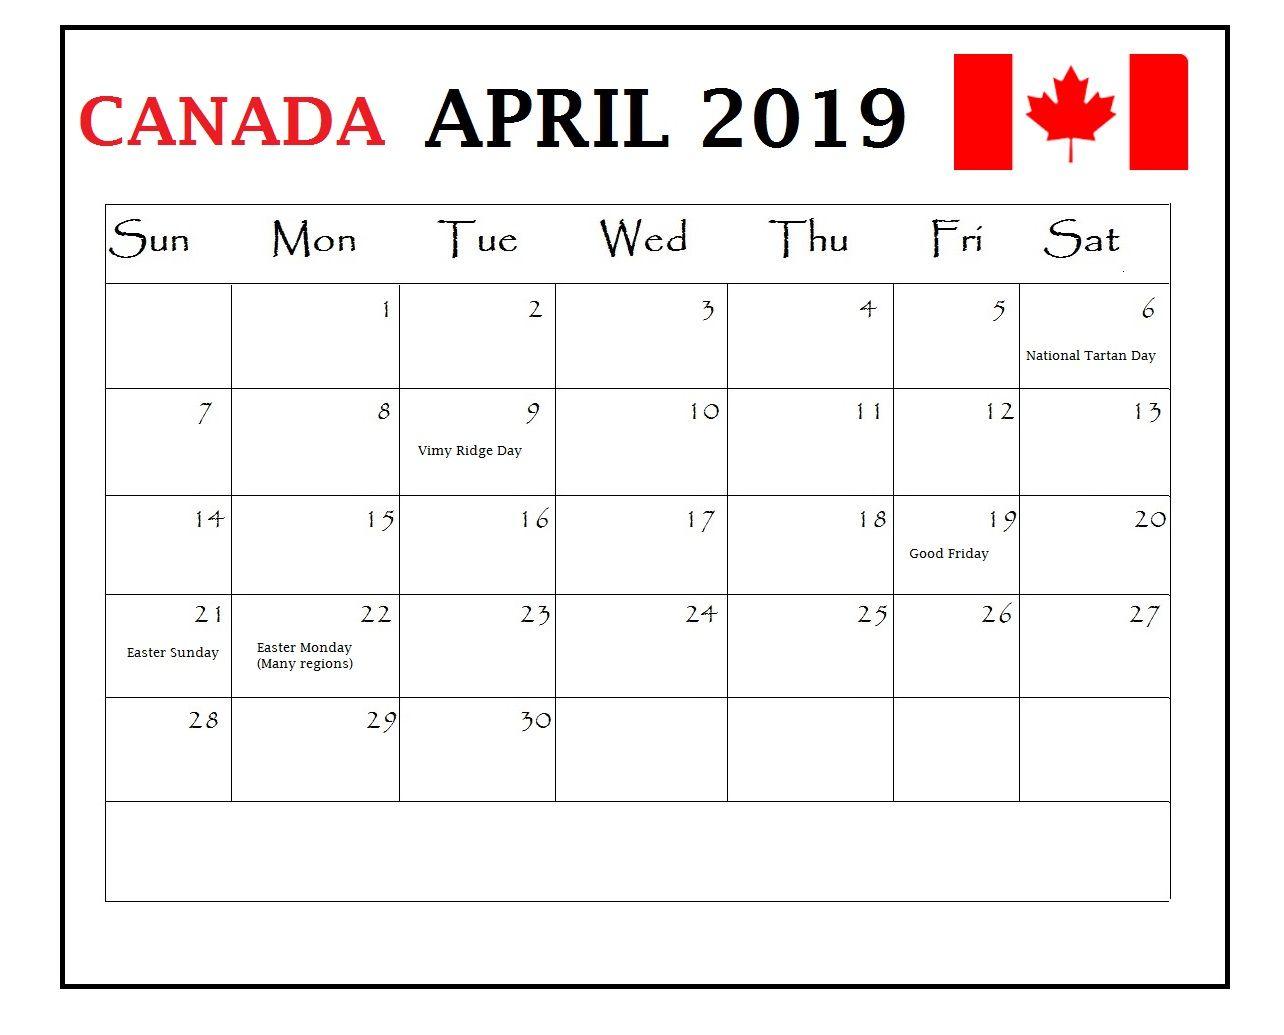 April 2019 Calendar Canada With Holidays